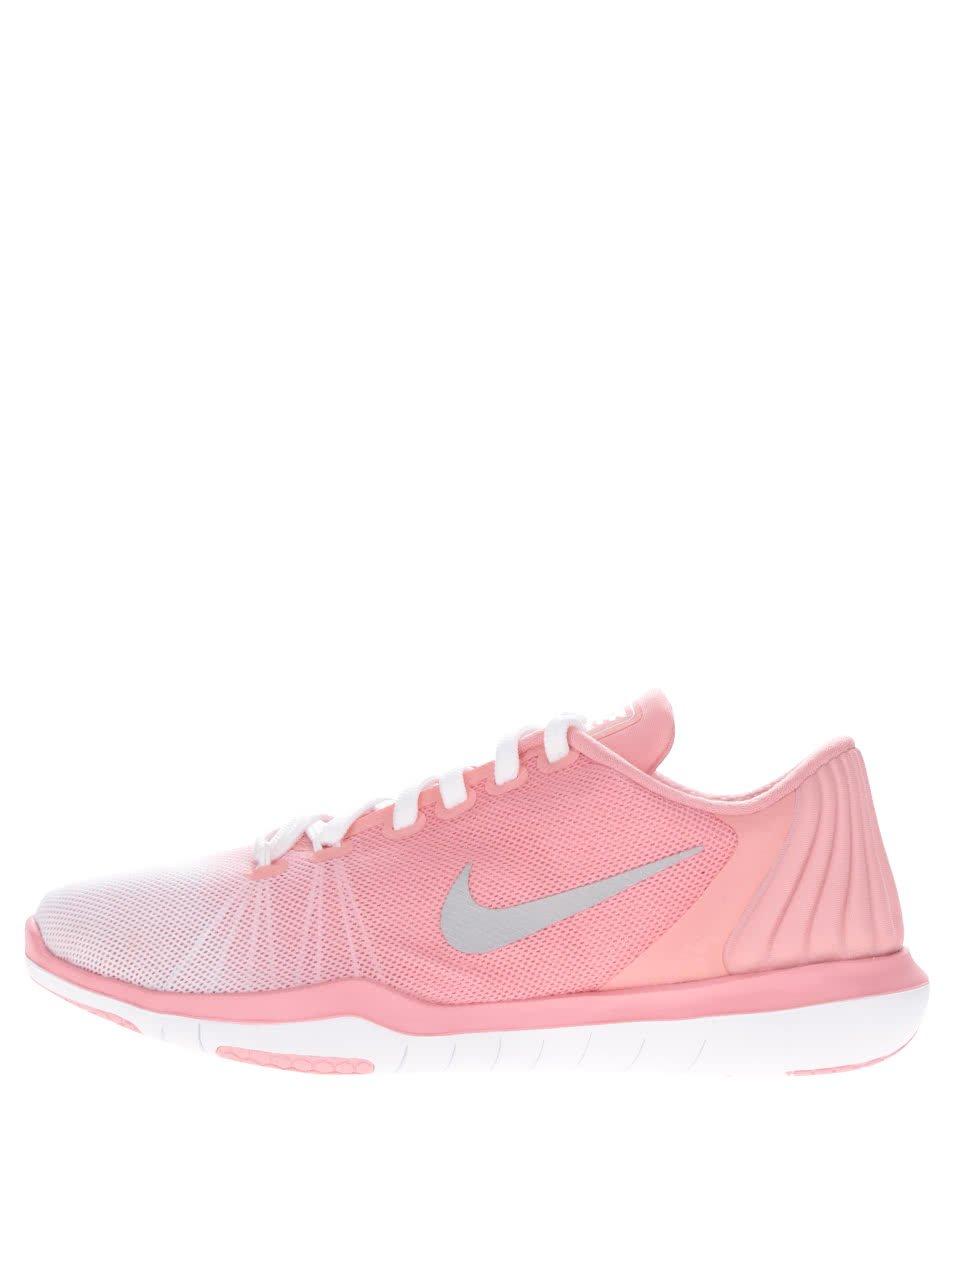 Bílo-růžové dámské tenisky Nike Flex Supreme